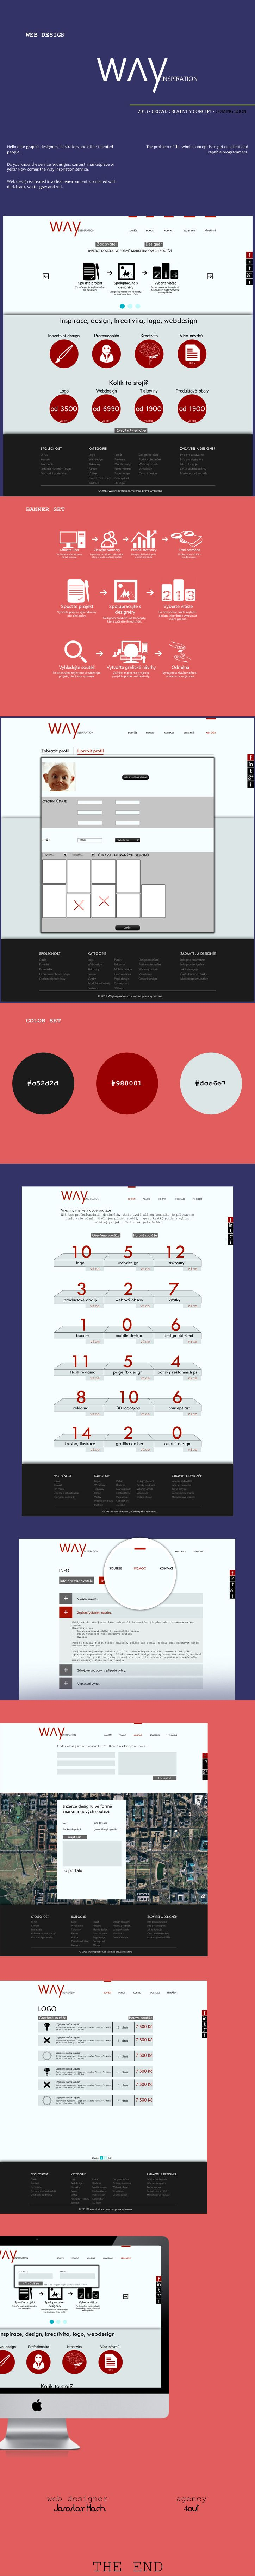 Web design Way inspiration :)